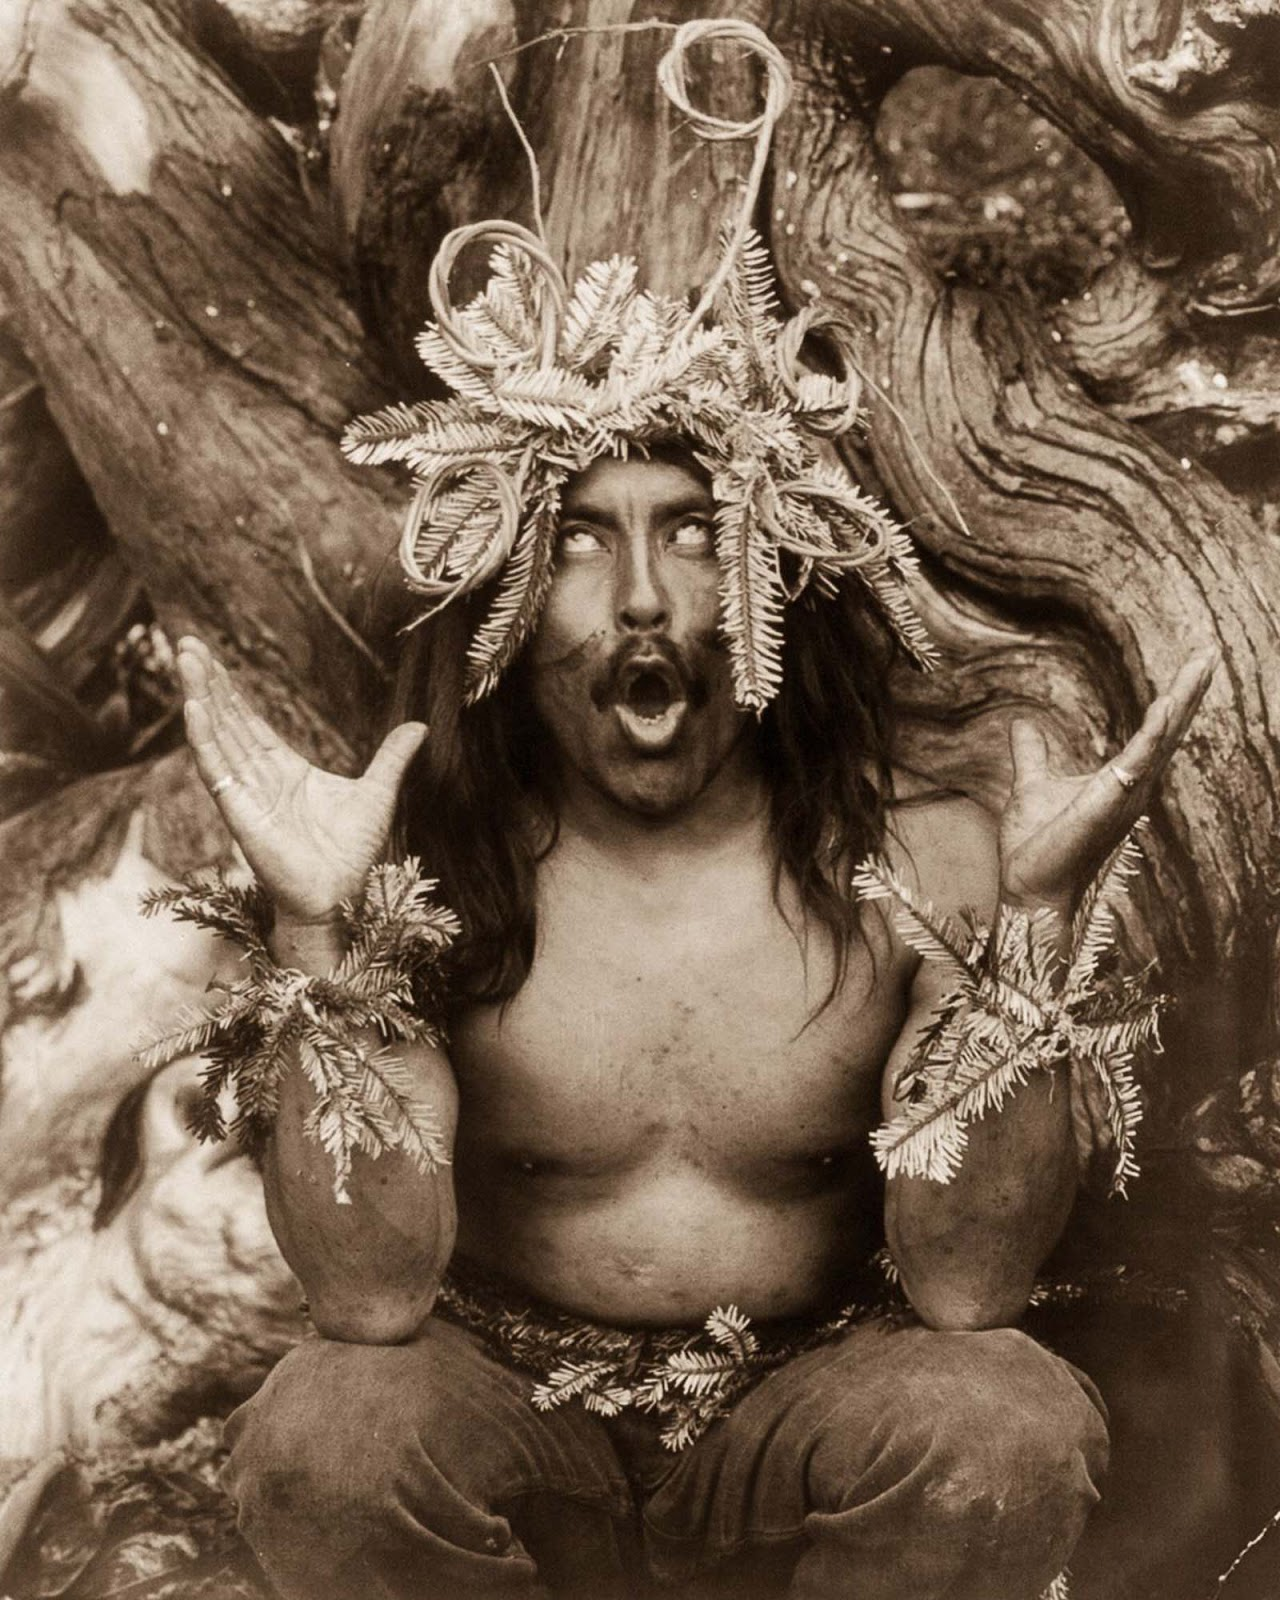 A Kwakiutl shaman performs a religious ritual. 1914.